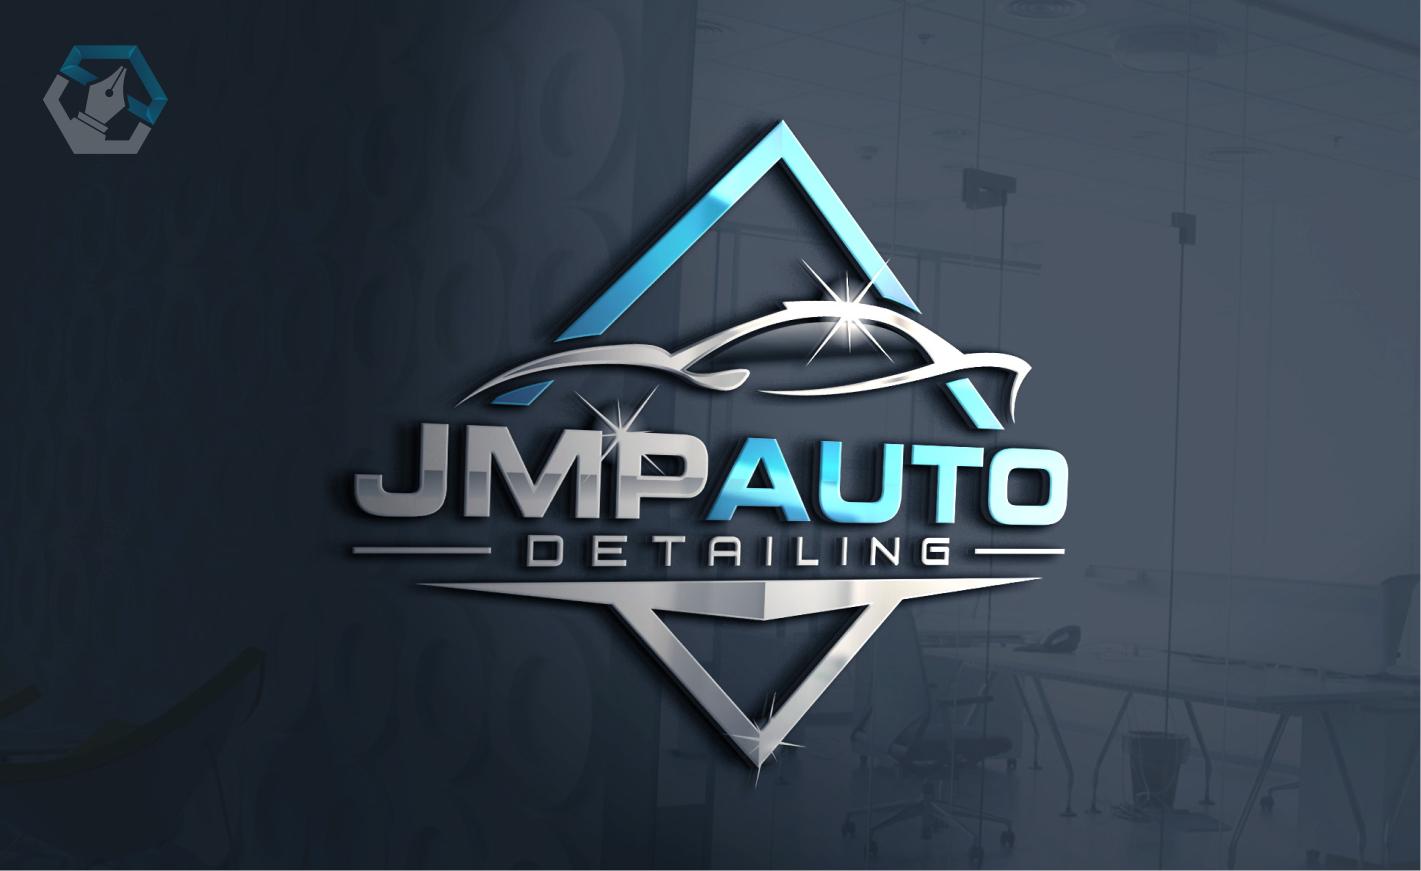 I will make a car logo in a modern,  sport style